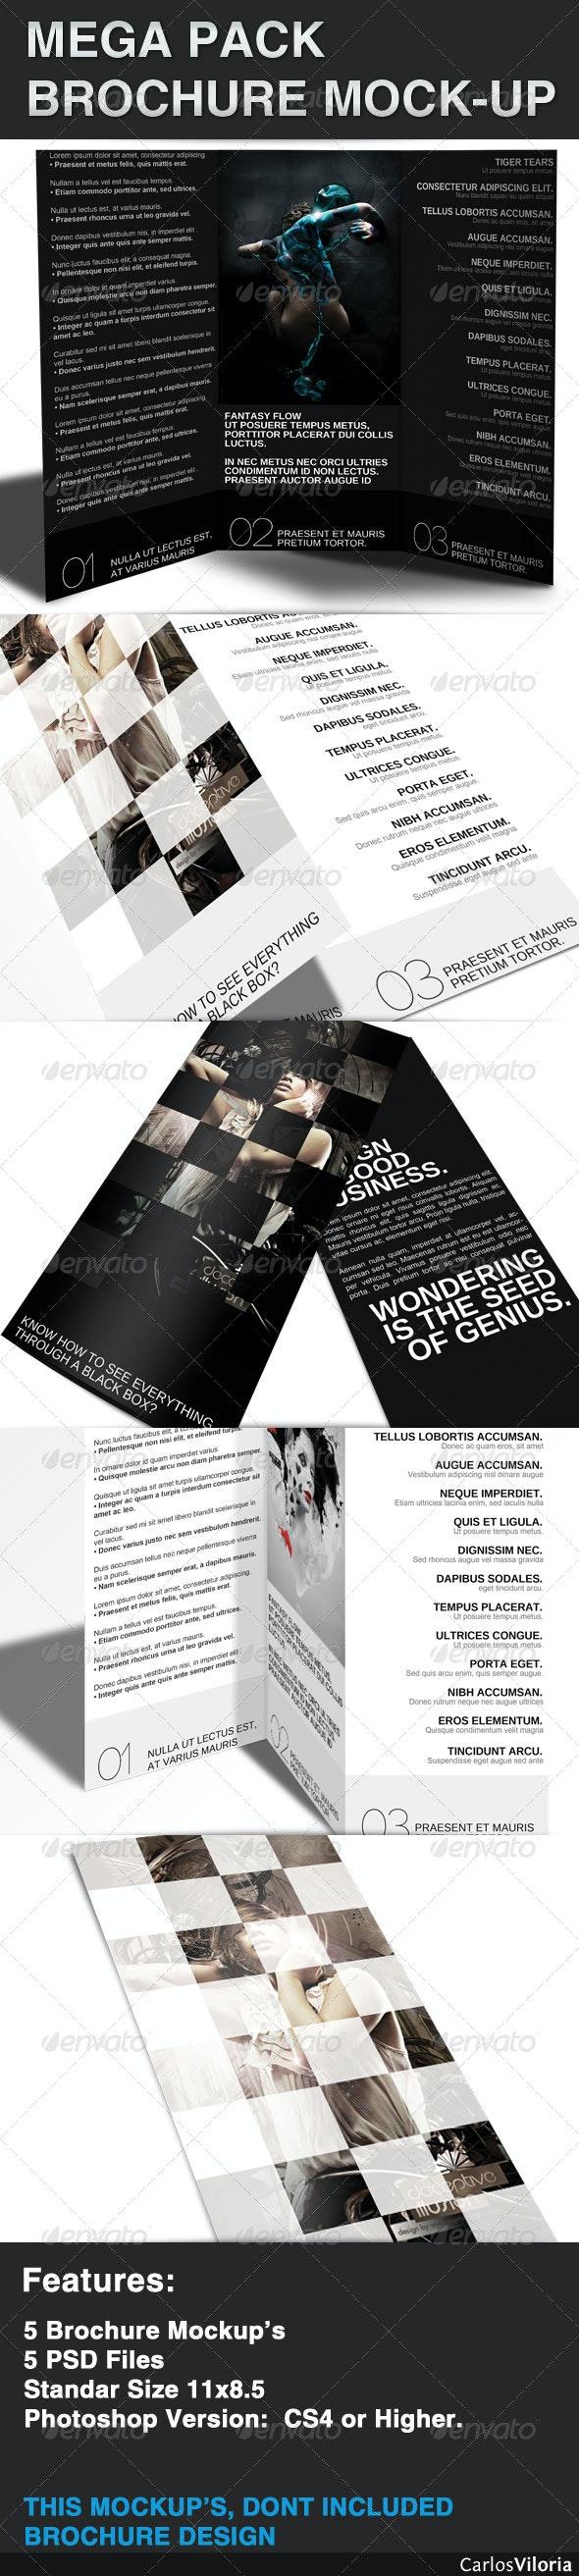 Mega pack Brochure - Mock-Up - Brochures Print